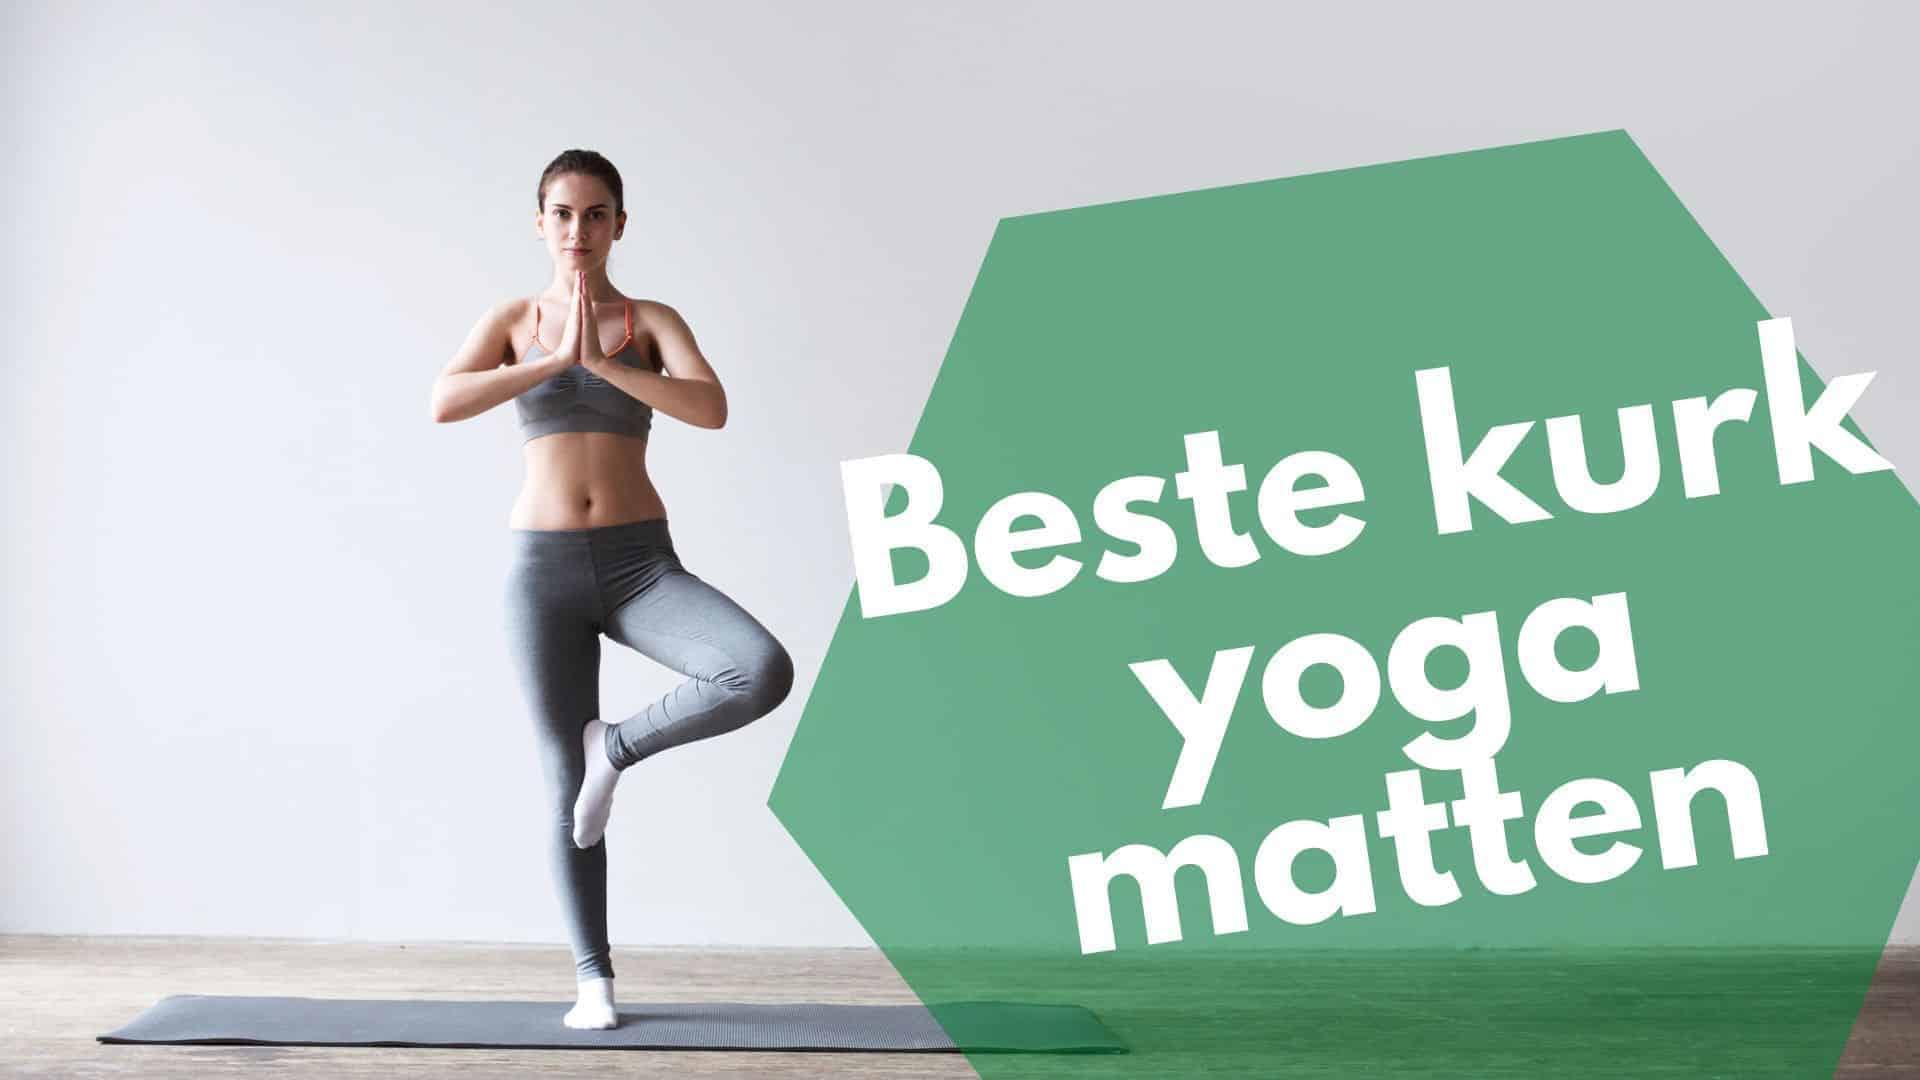 Kurk yoga mat, blok & wiel